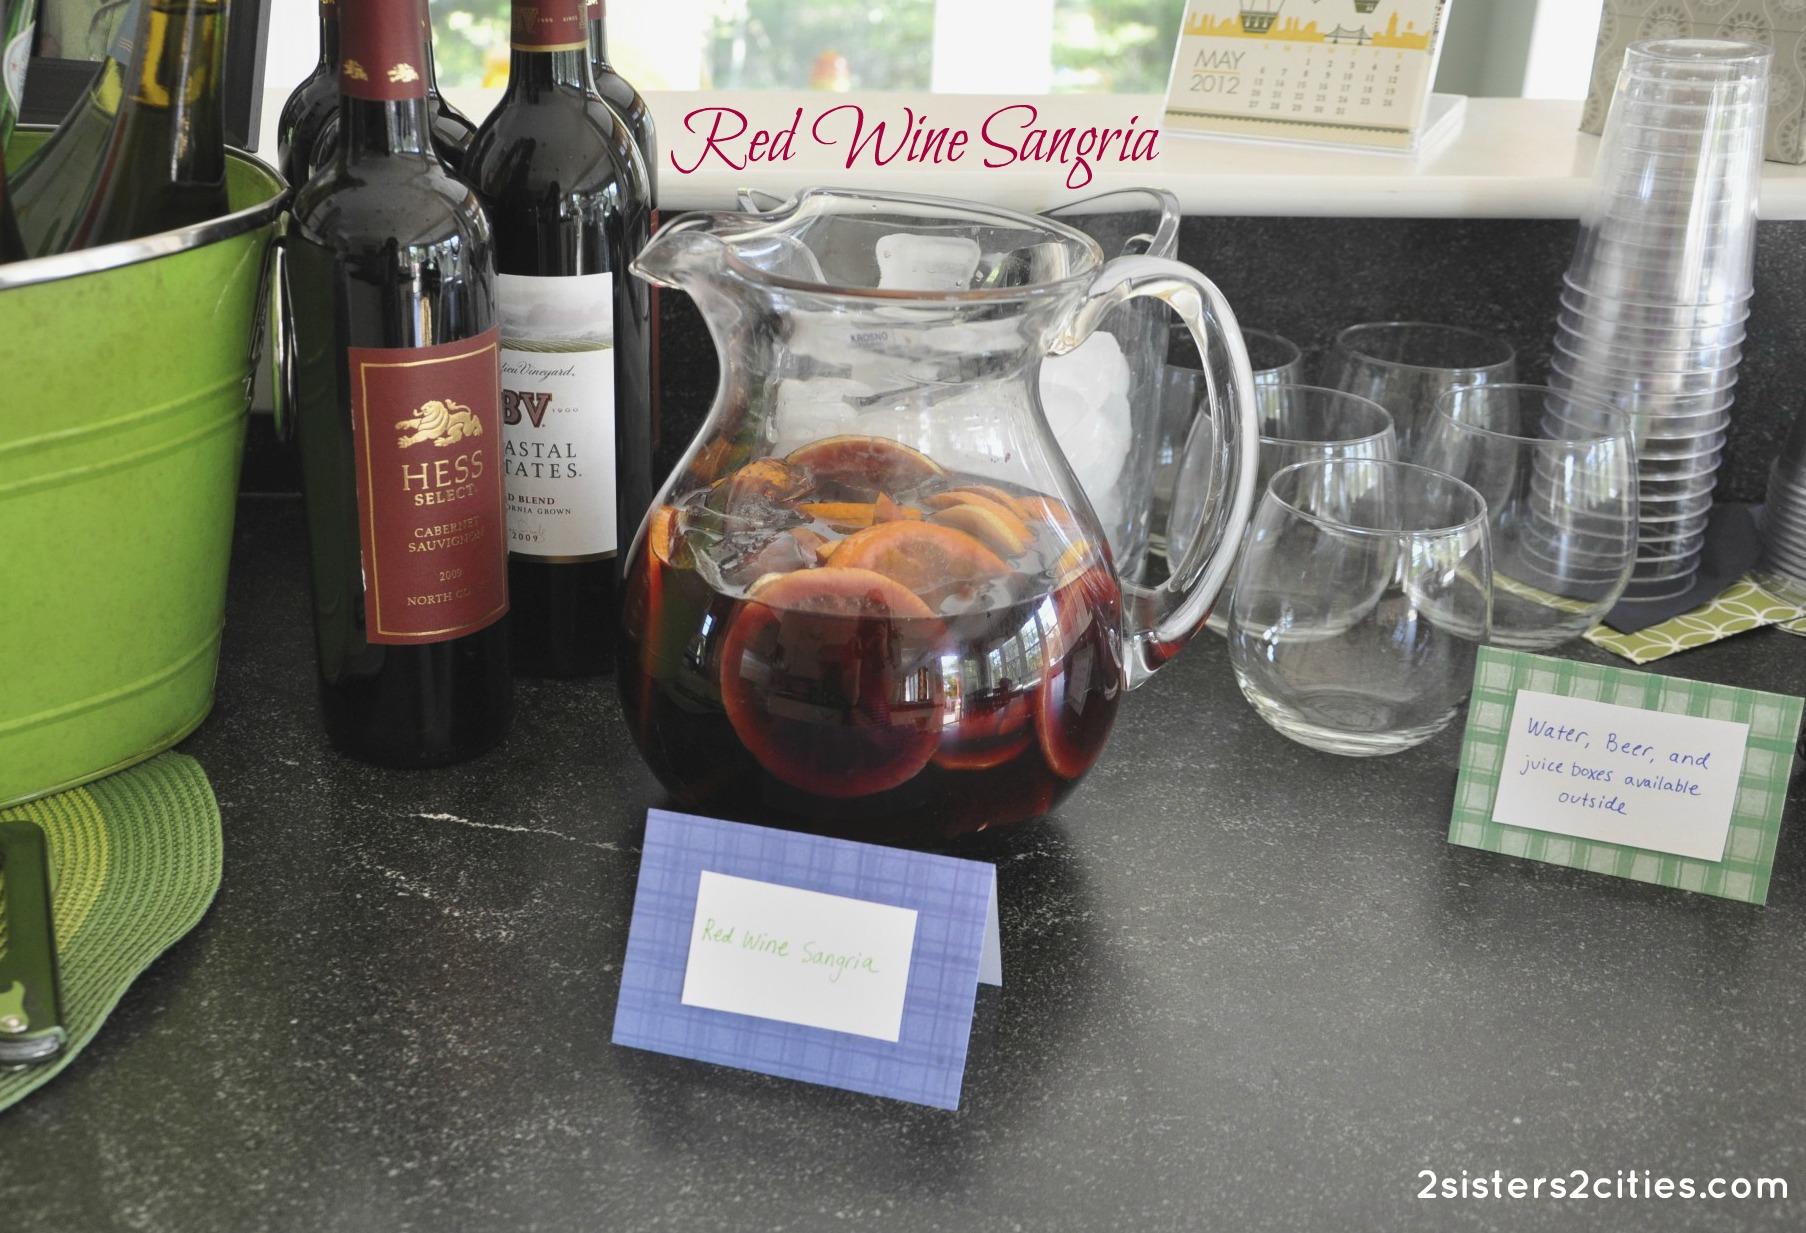 Sangria pig backyard bbq 2 sisters 2 cities for Sangria recipe red wine triple sec